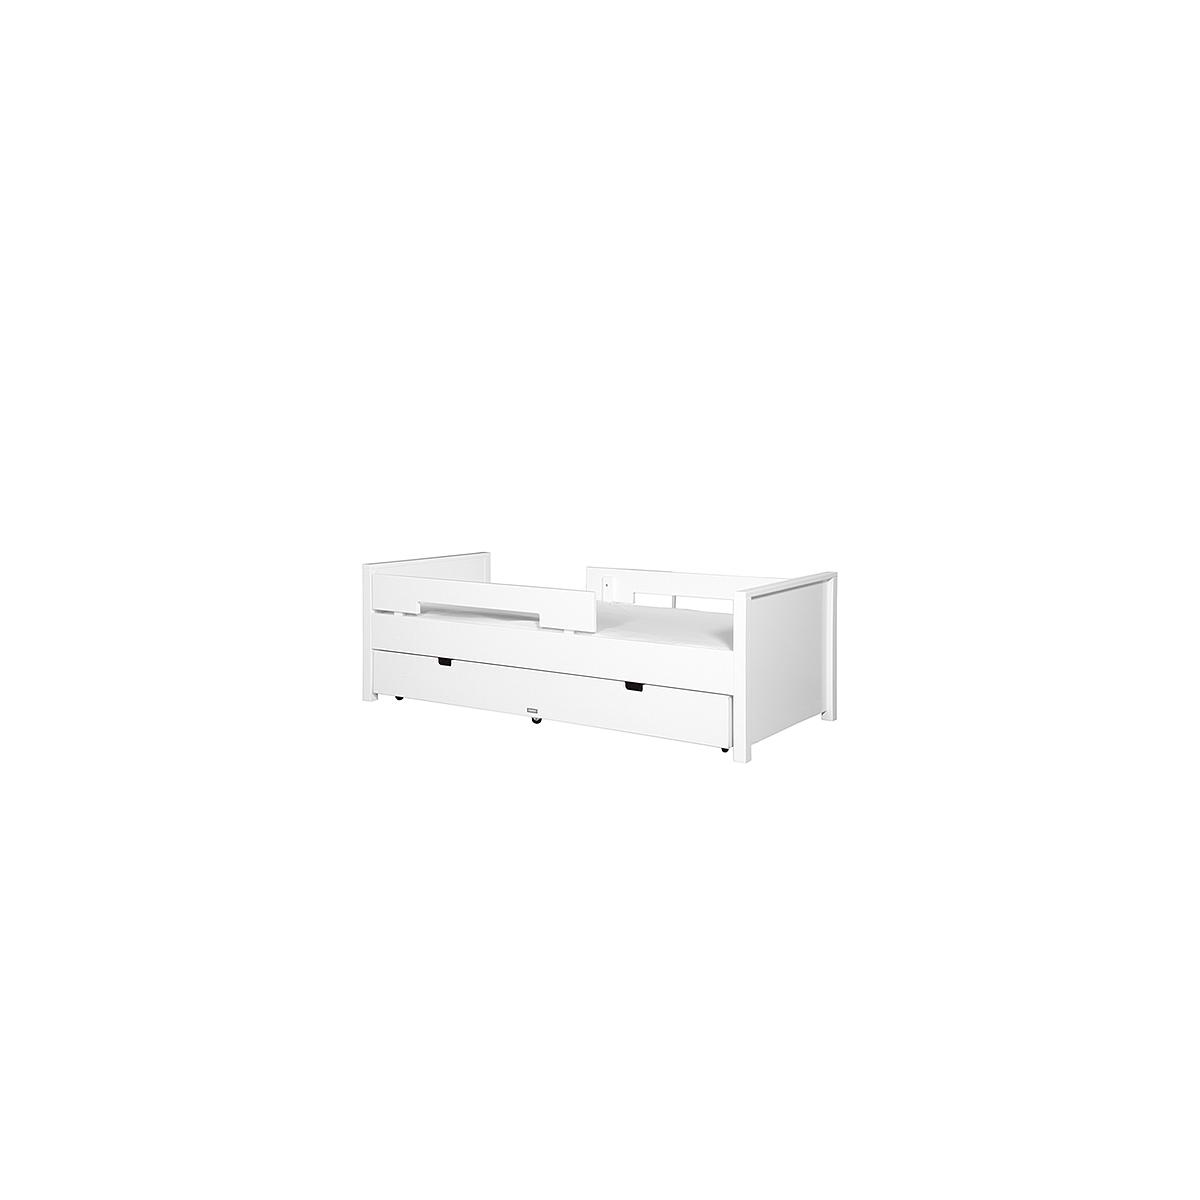 Cama-cajón nido 90x200cm JONNE Bopita blanco